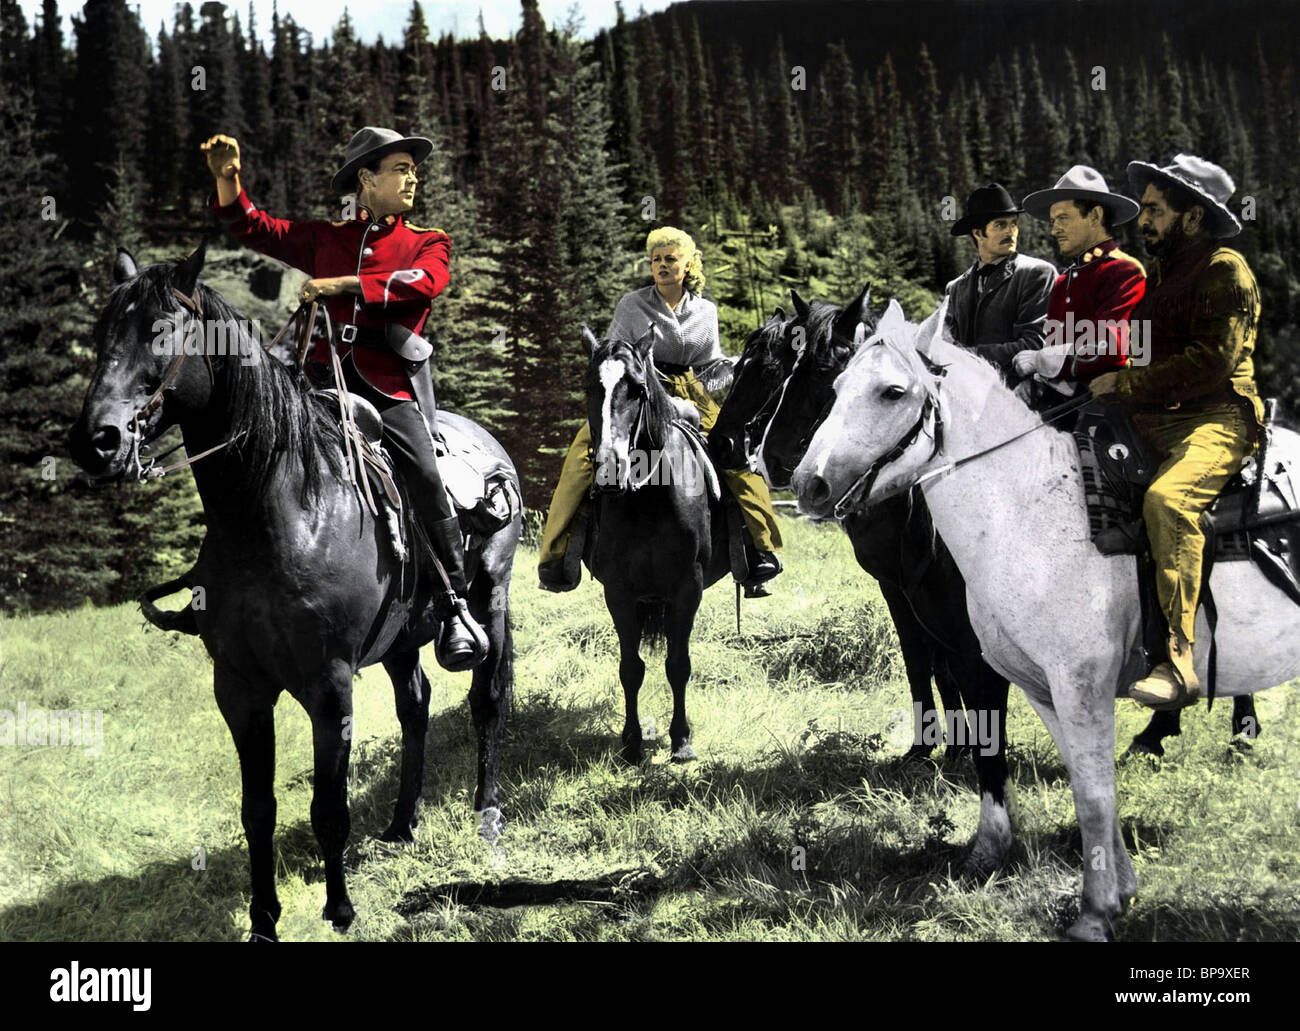 ALAN LADD & SHELLEY WINTERS O'ROURKE OF THE ROYAL MOUNTED; SASKATCHEWAN (1954) - Stock Image